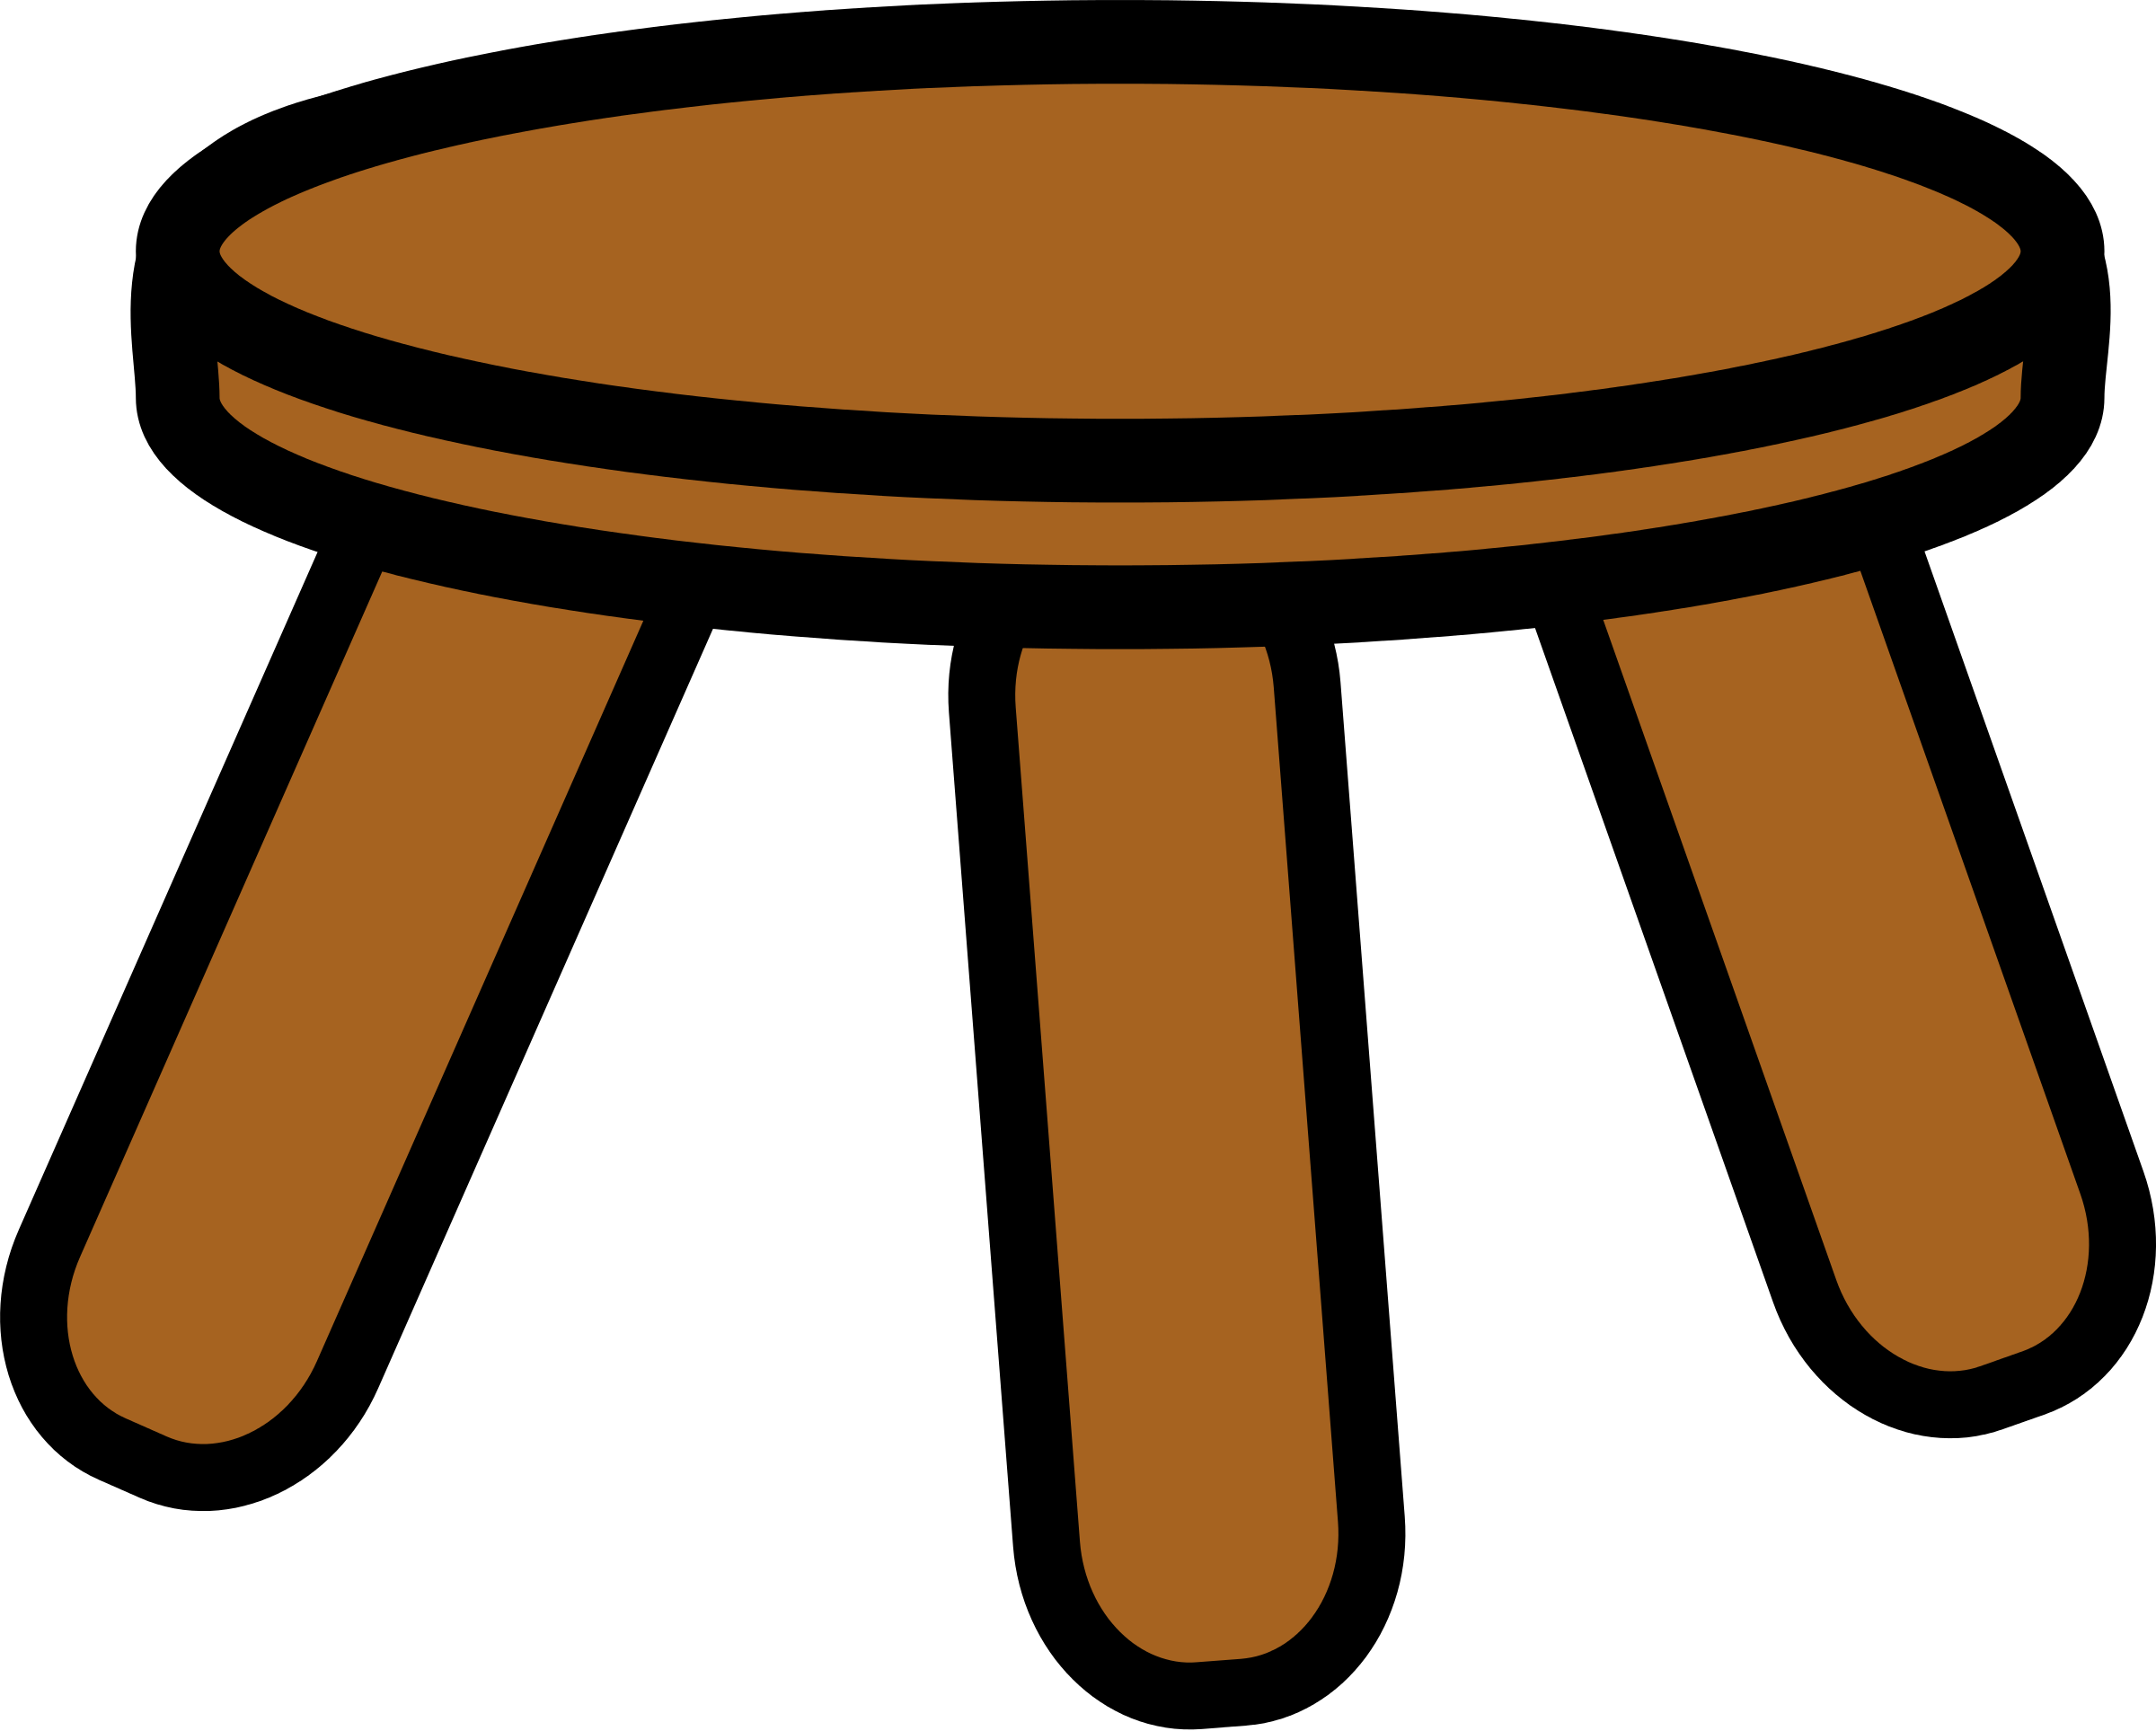 Feet clipart orange. Wooden foot stool panda